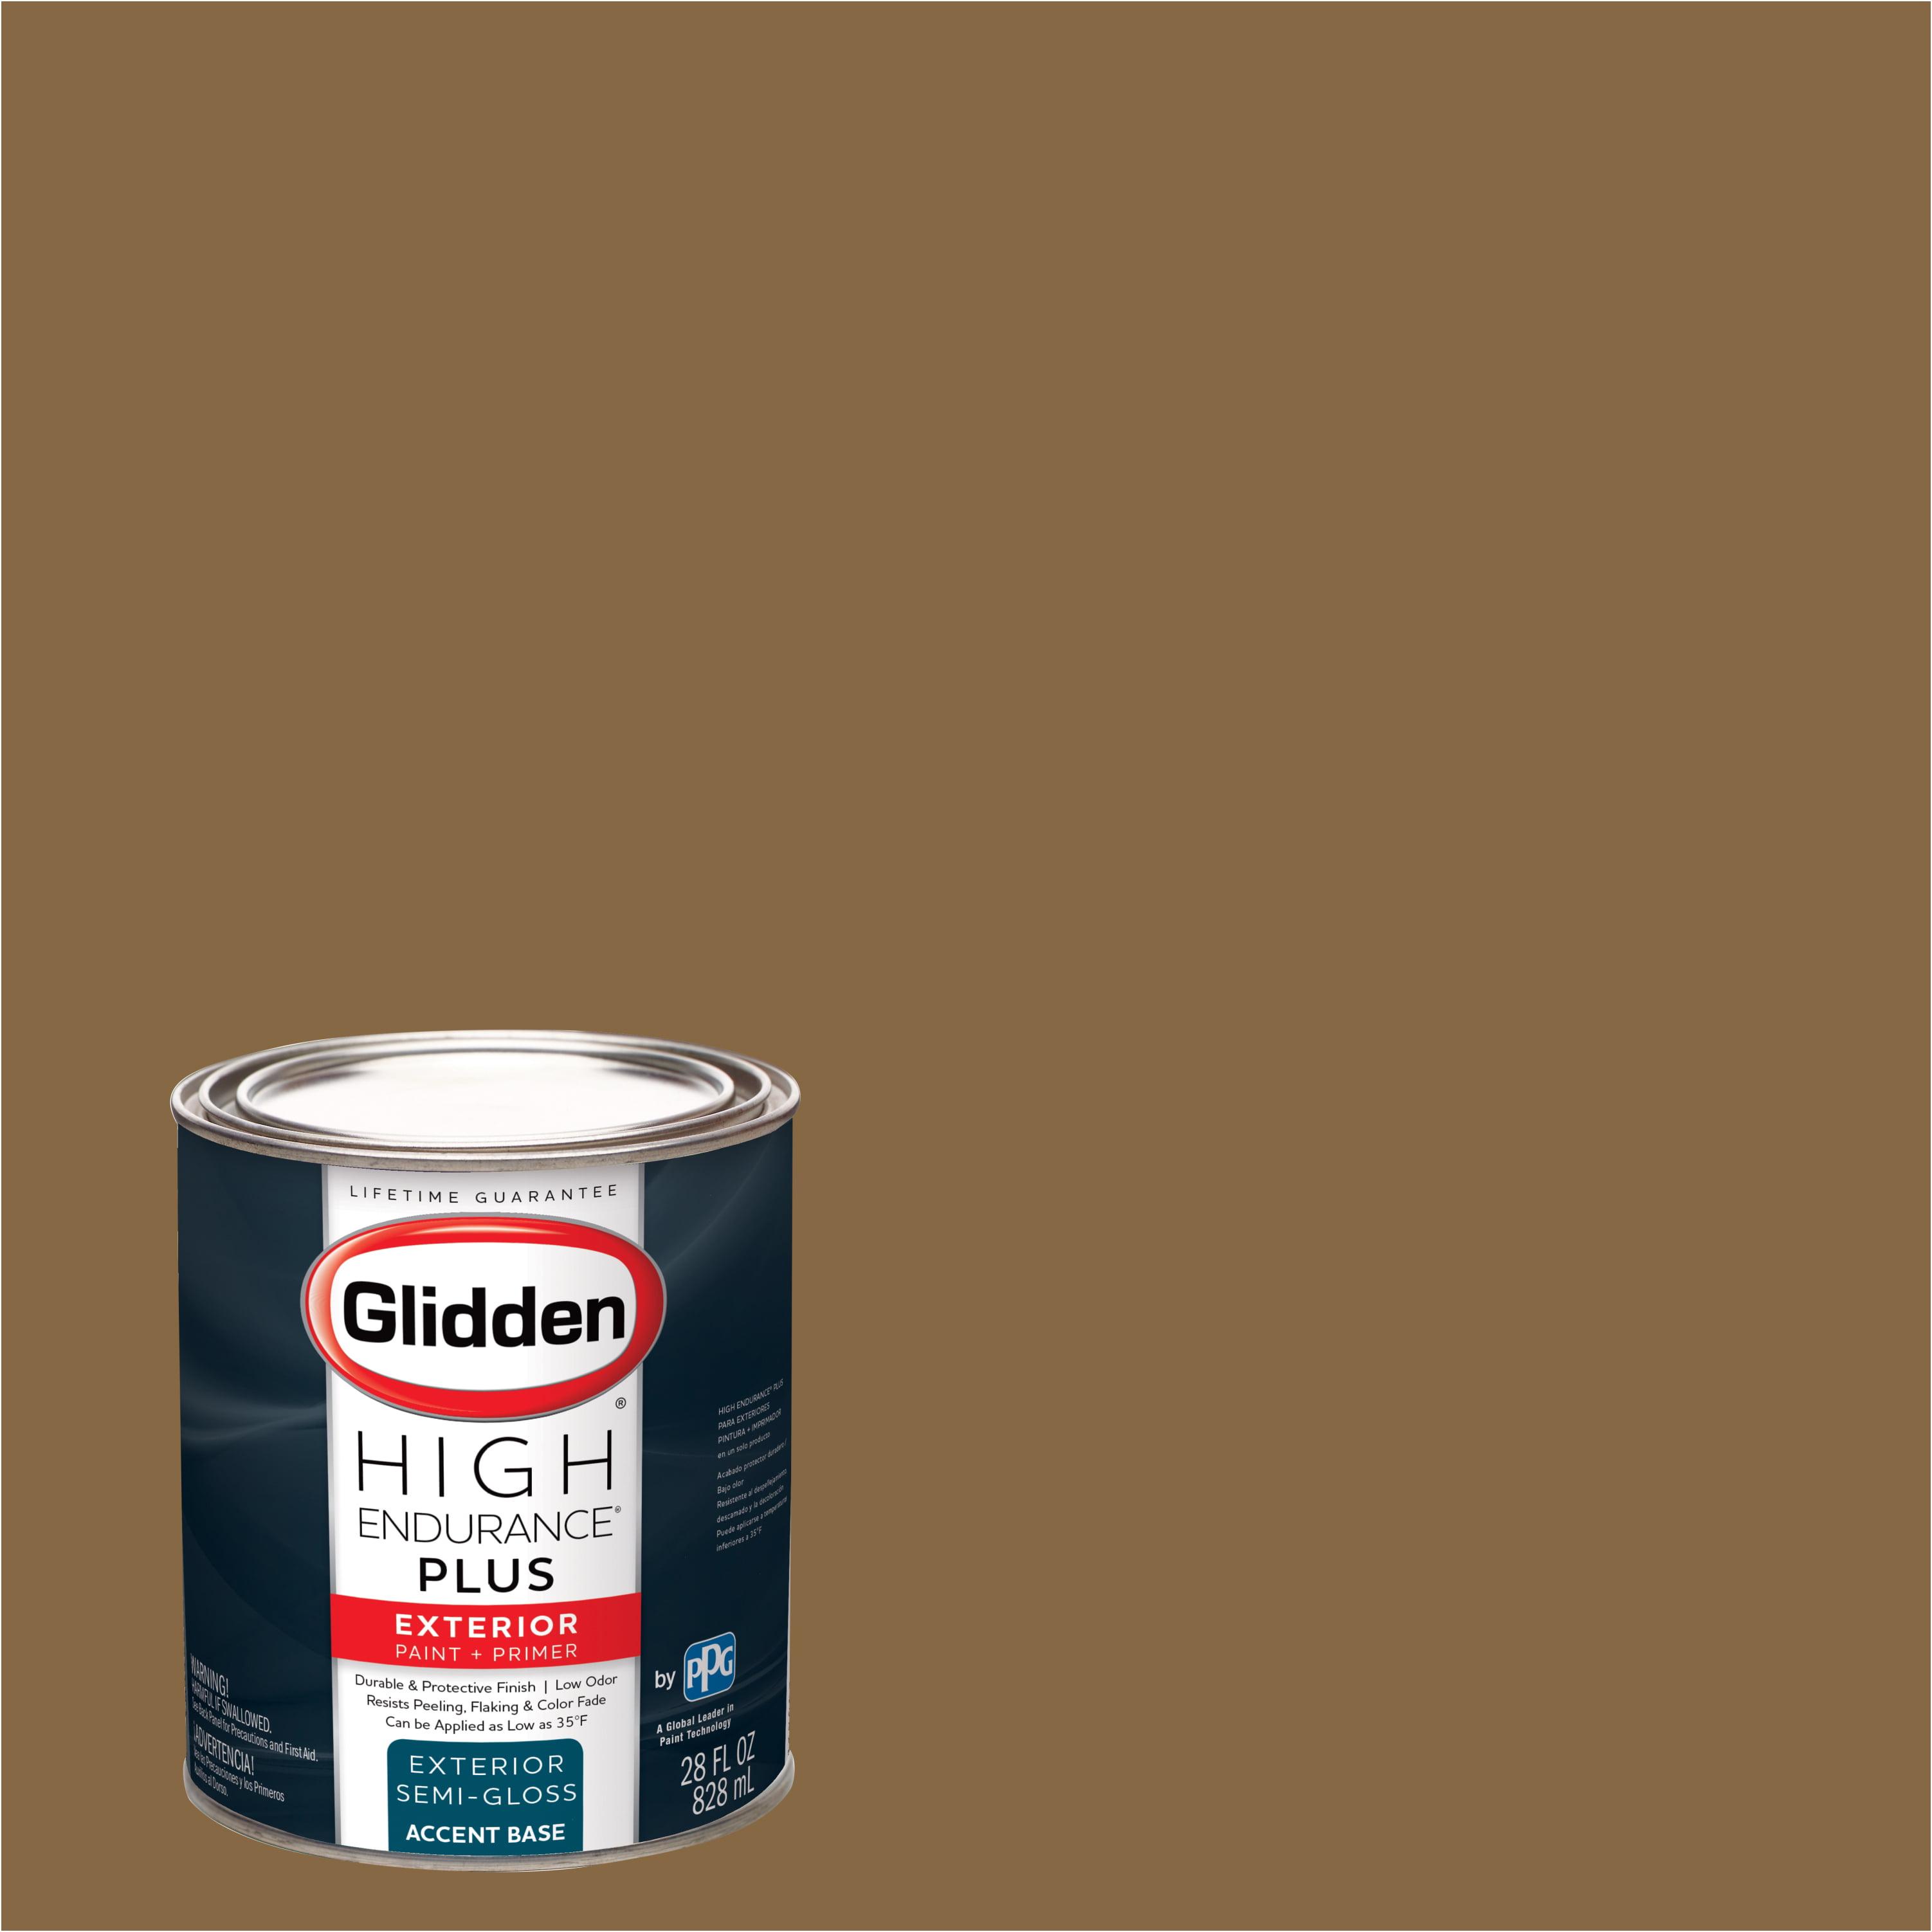 Glidden High Endurance Plus Exterior Paint and Primer, Goldstone, #00YY 19/261